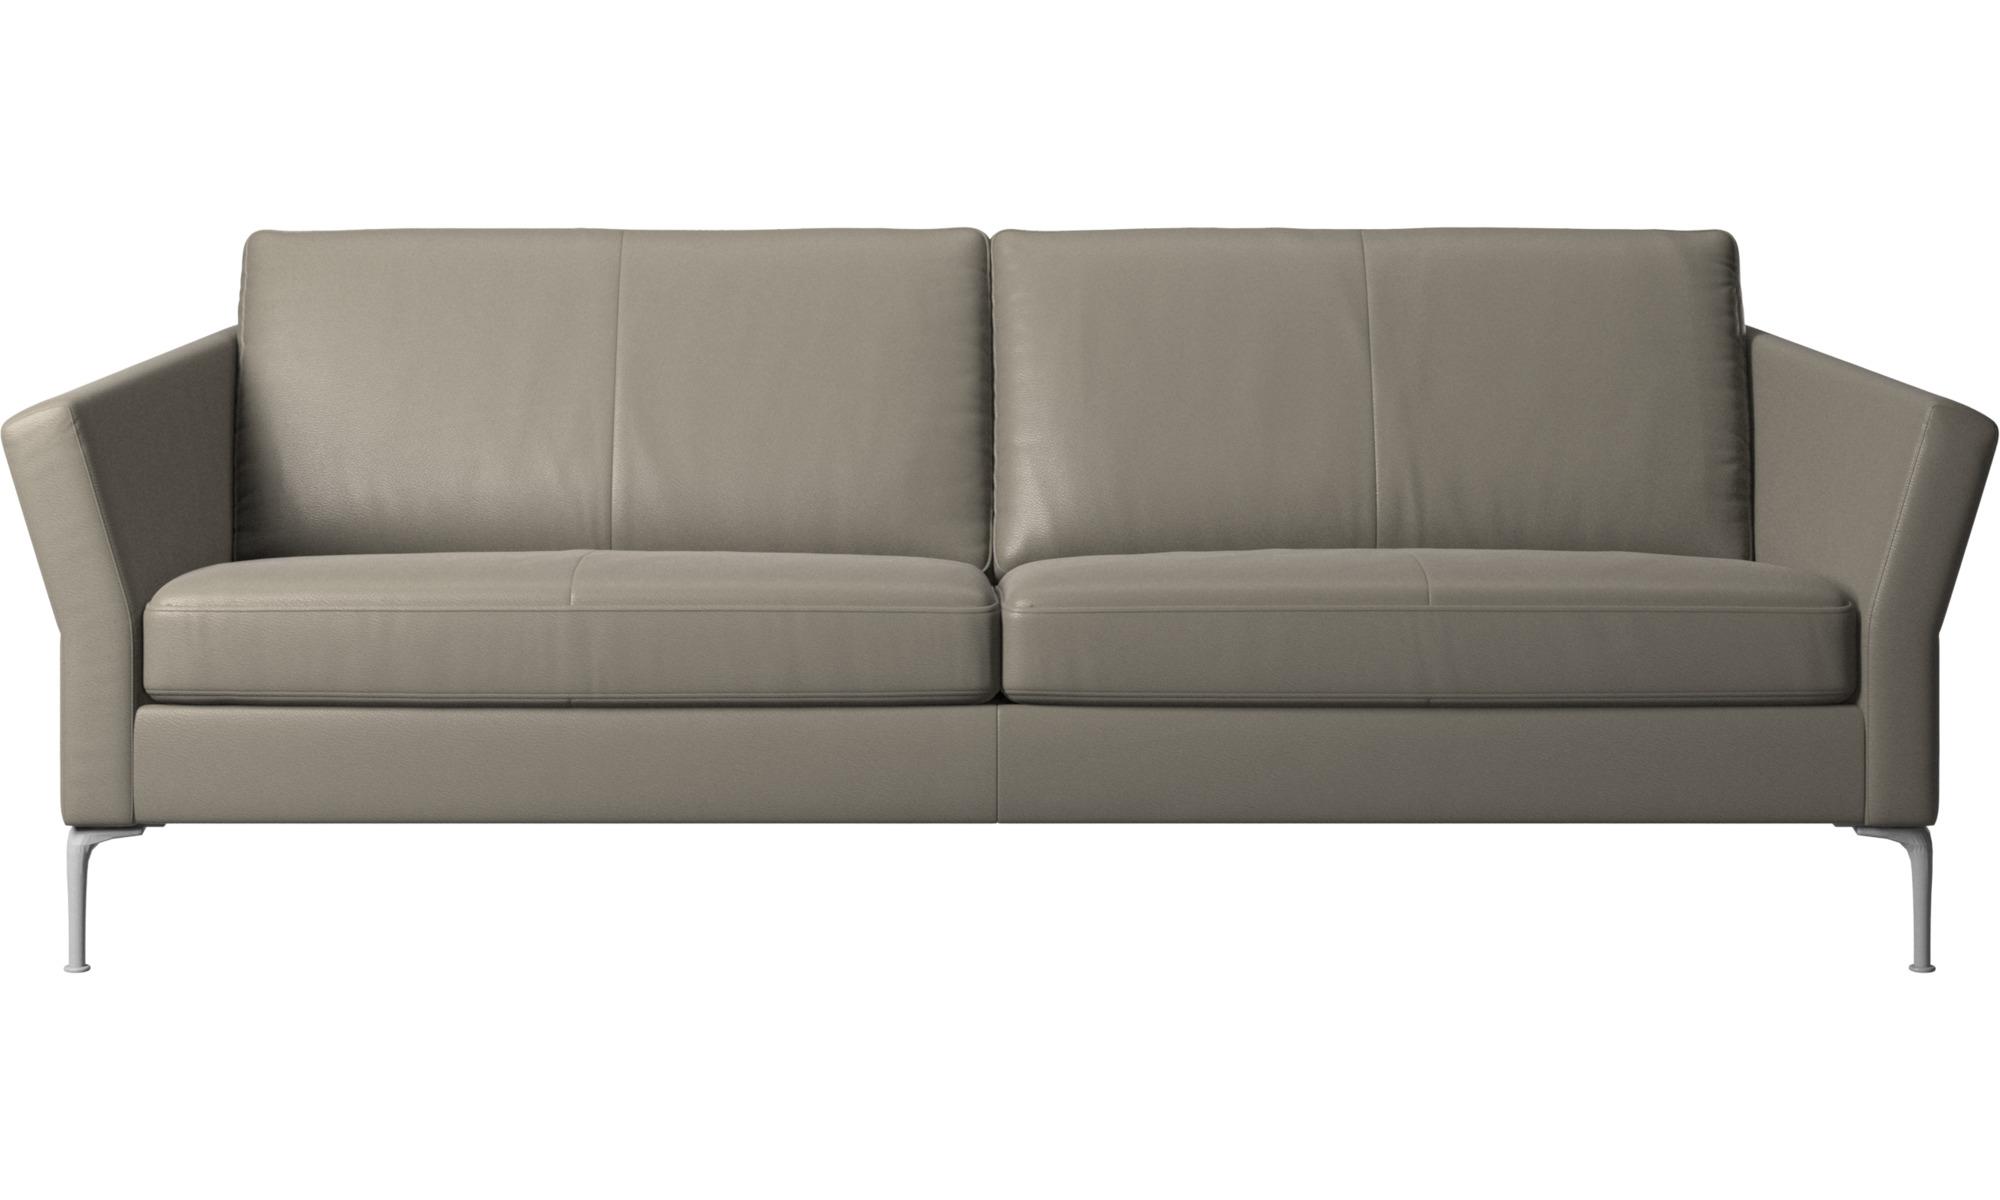 3 personers sofaer - Marseille sofa - Grå - Læder